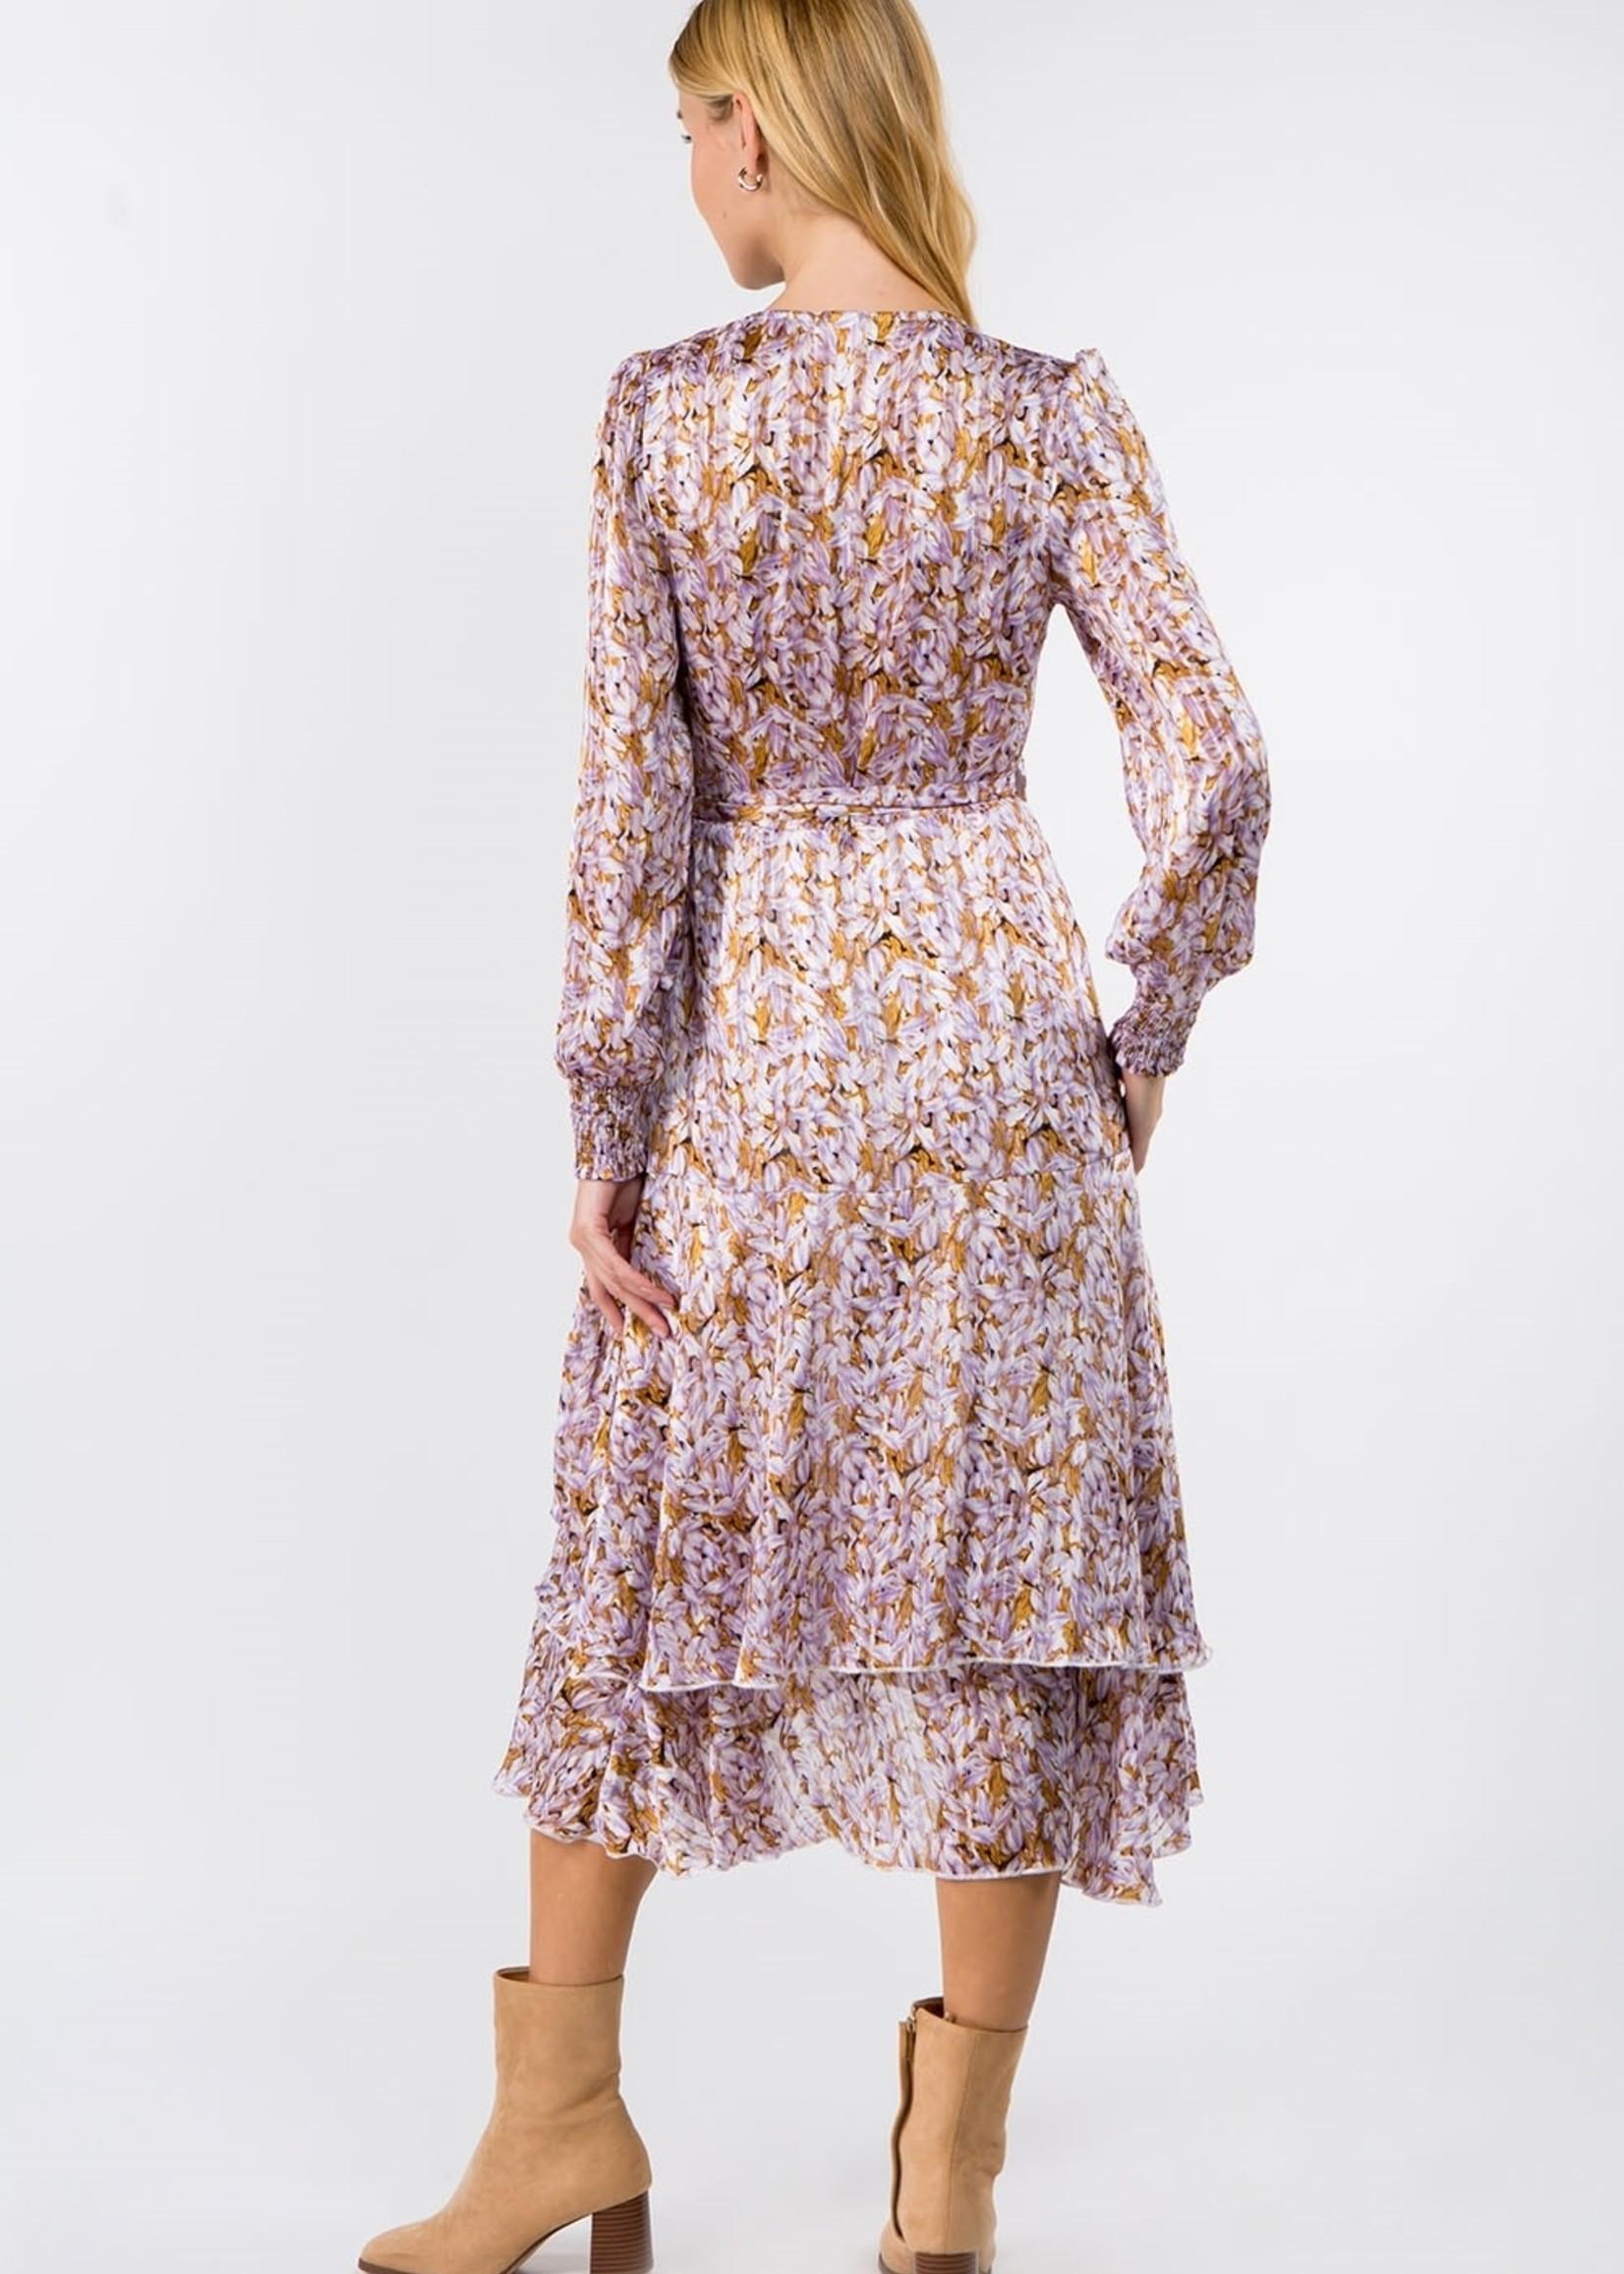 Fanco Floral Chiffon Midi Dress